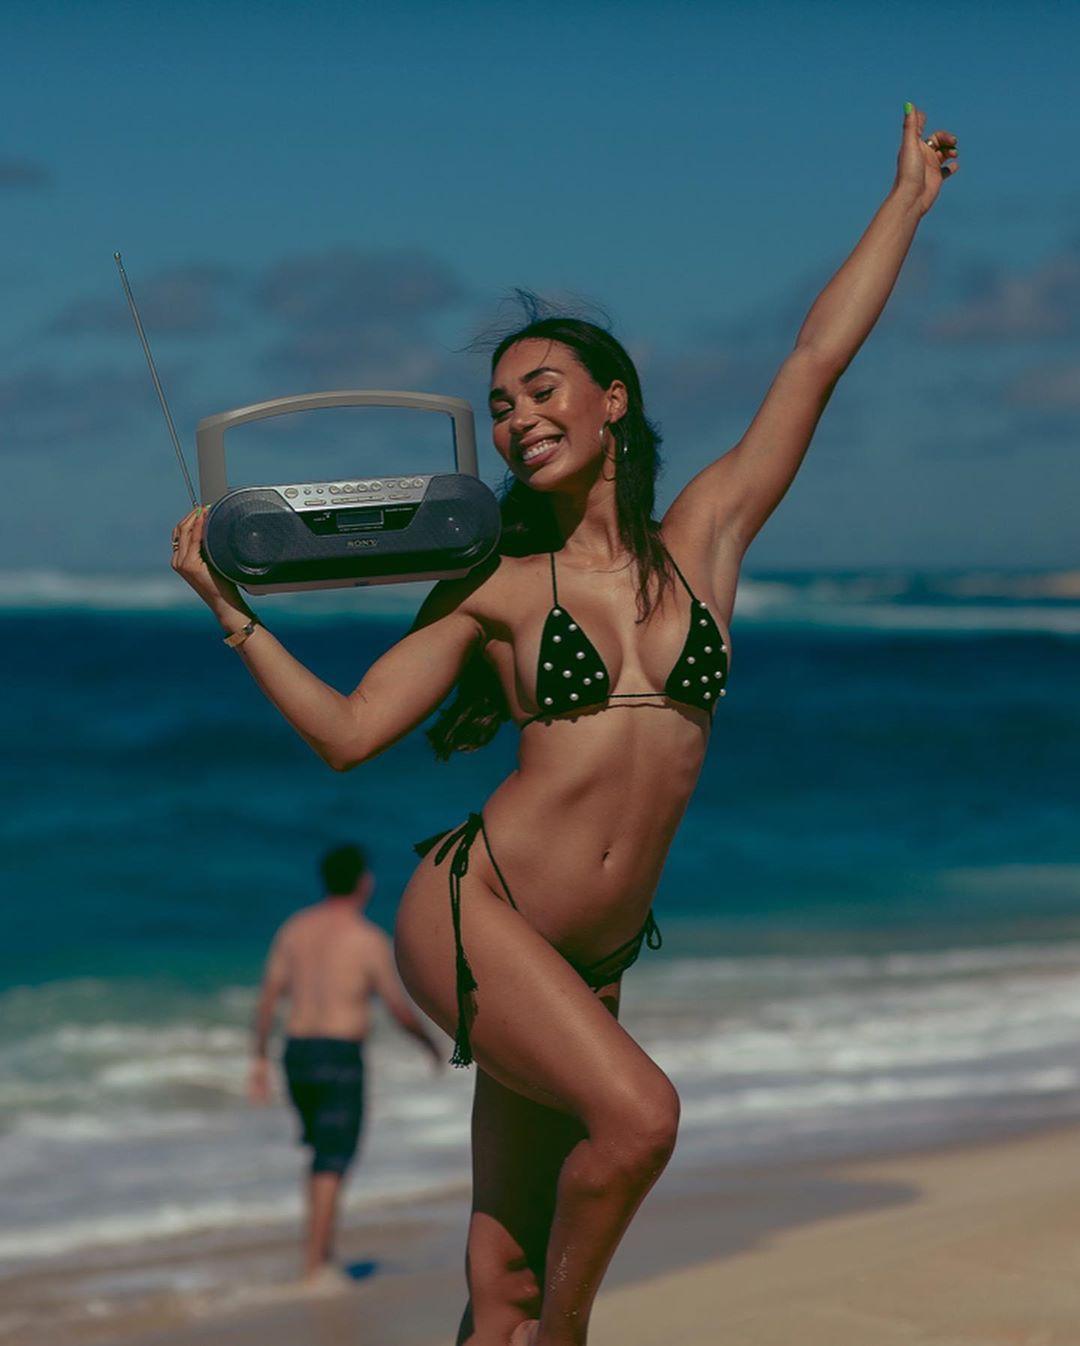 Eva Gutowski sexy bikini models swimwear style outfit, sexy leg picture